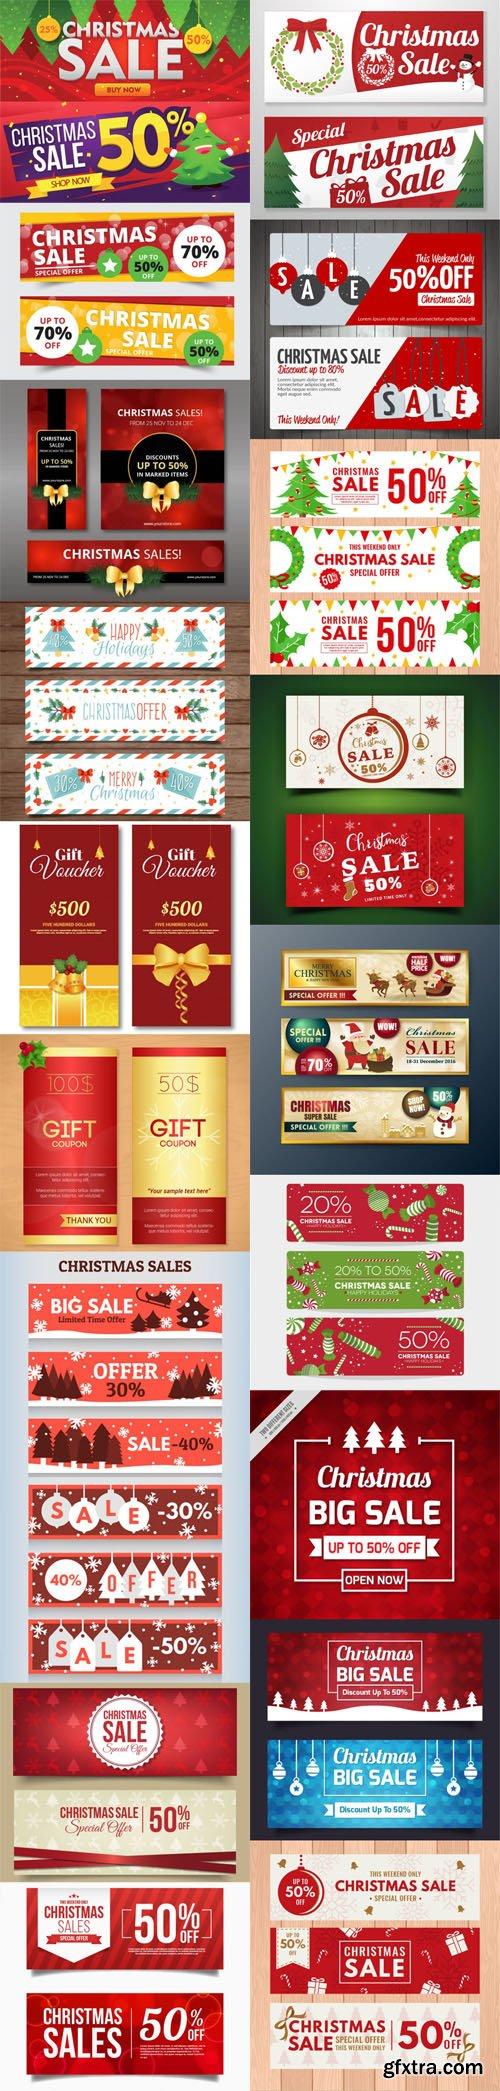 Holiday & Christmas Sales Vector Bundle 5